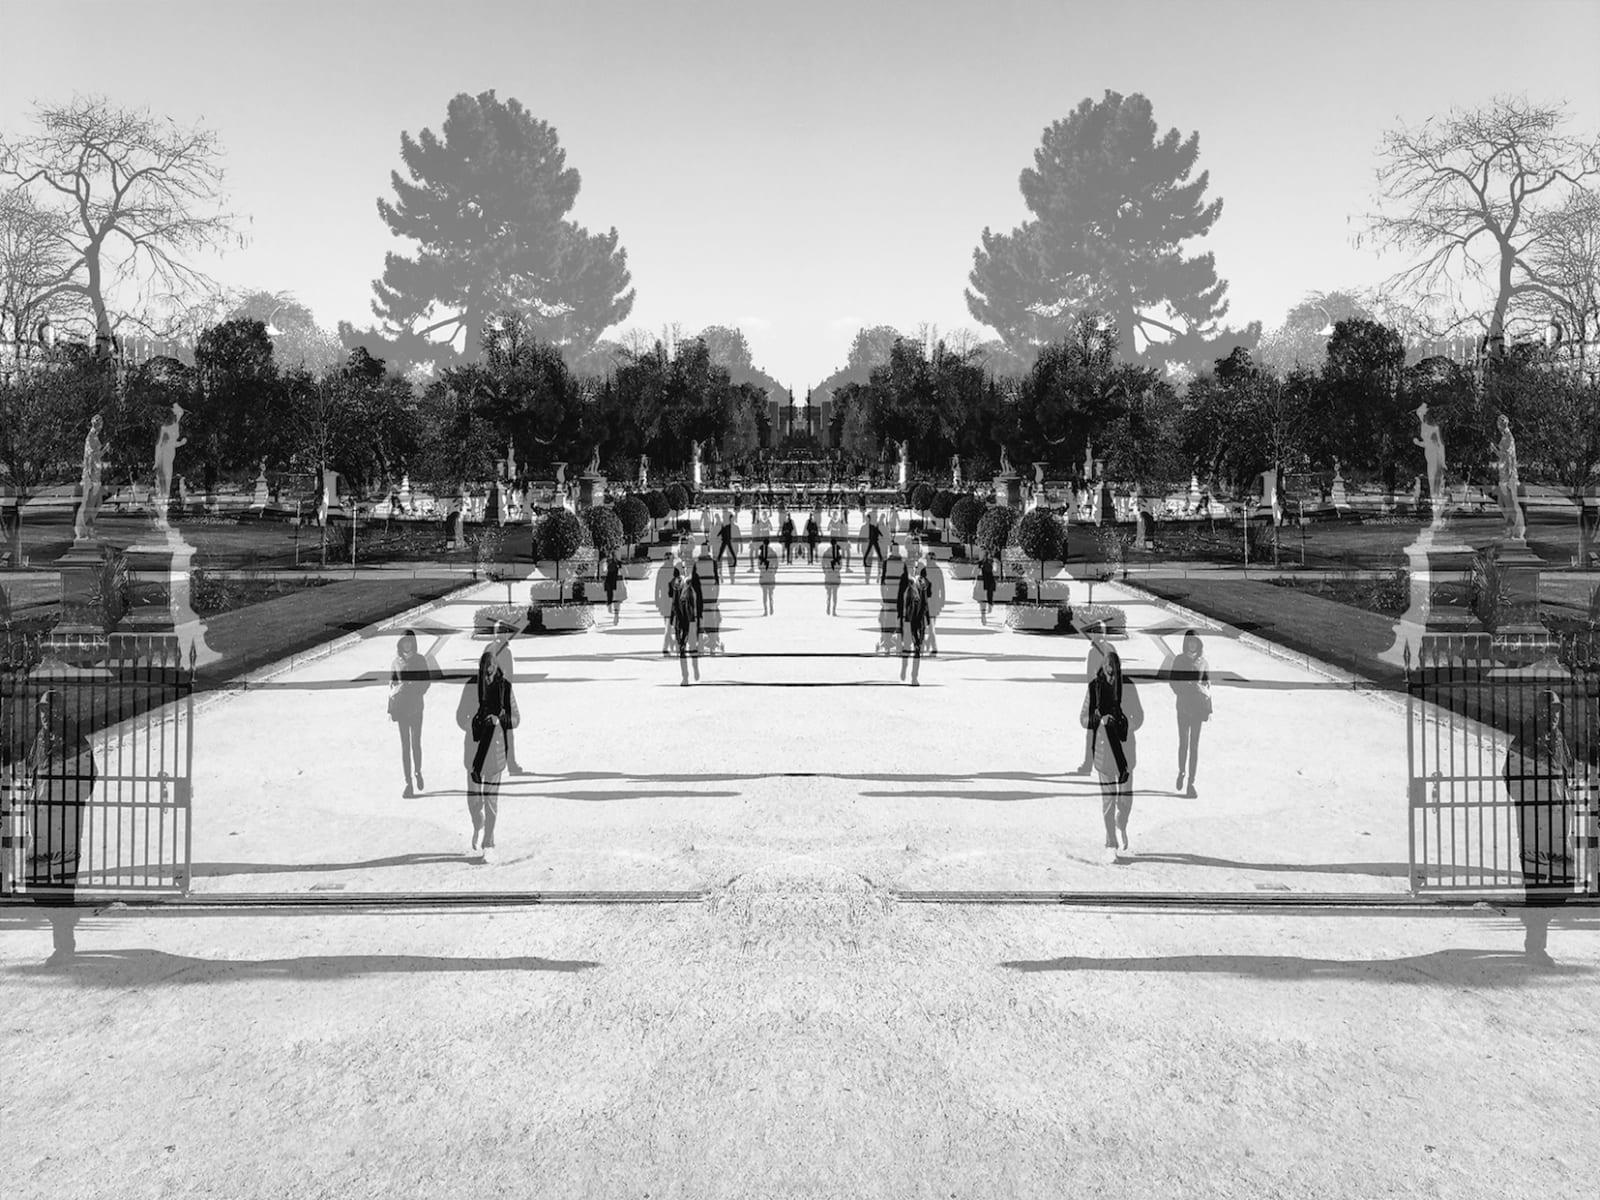 Alastair Whitton, Jardin des Tuileries II, Paris, 2018